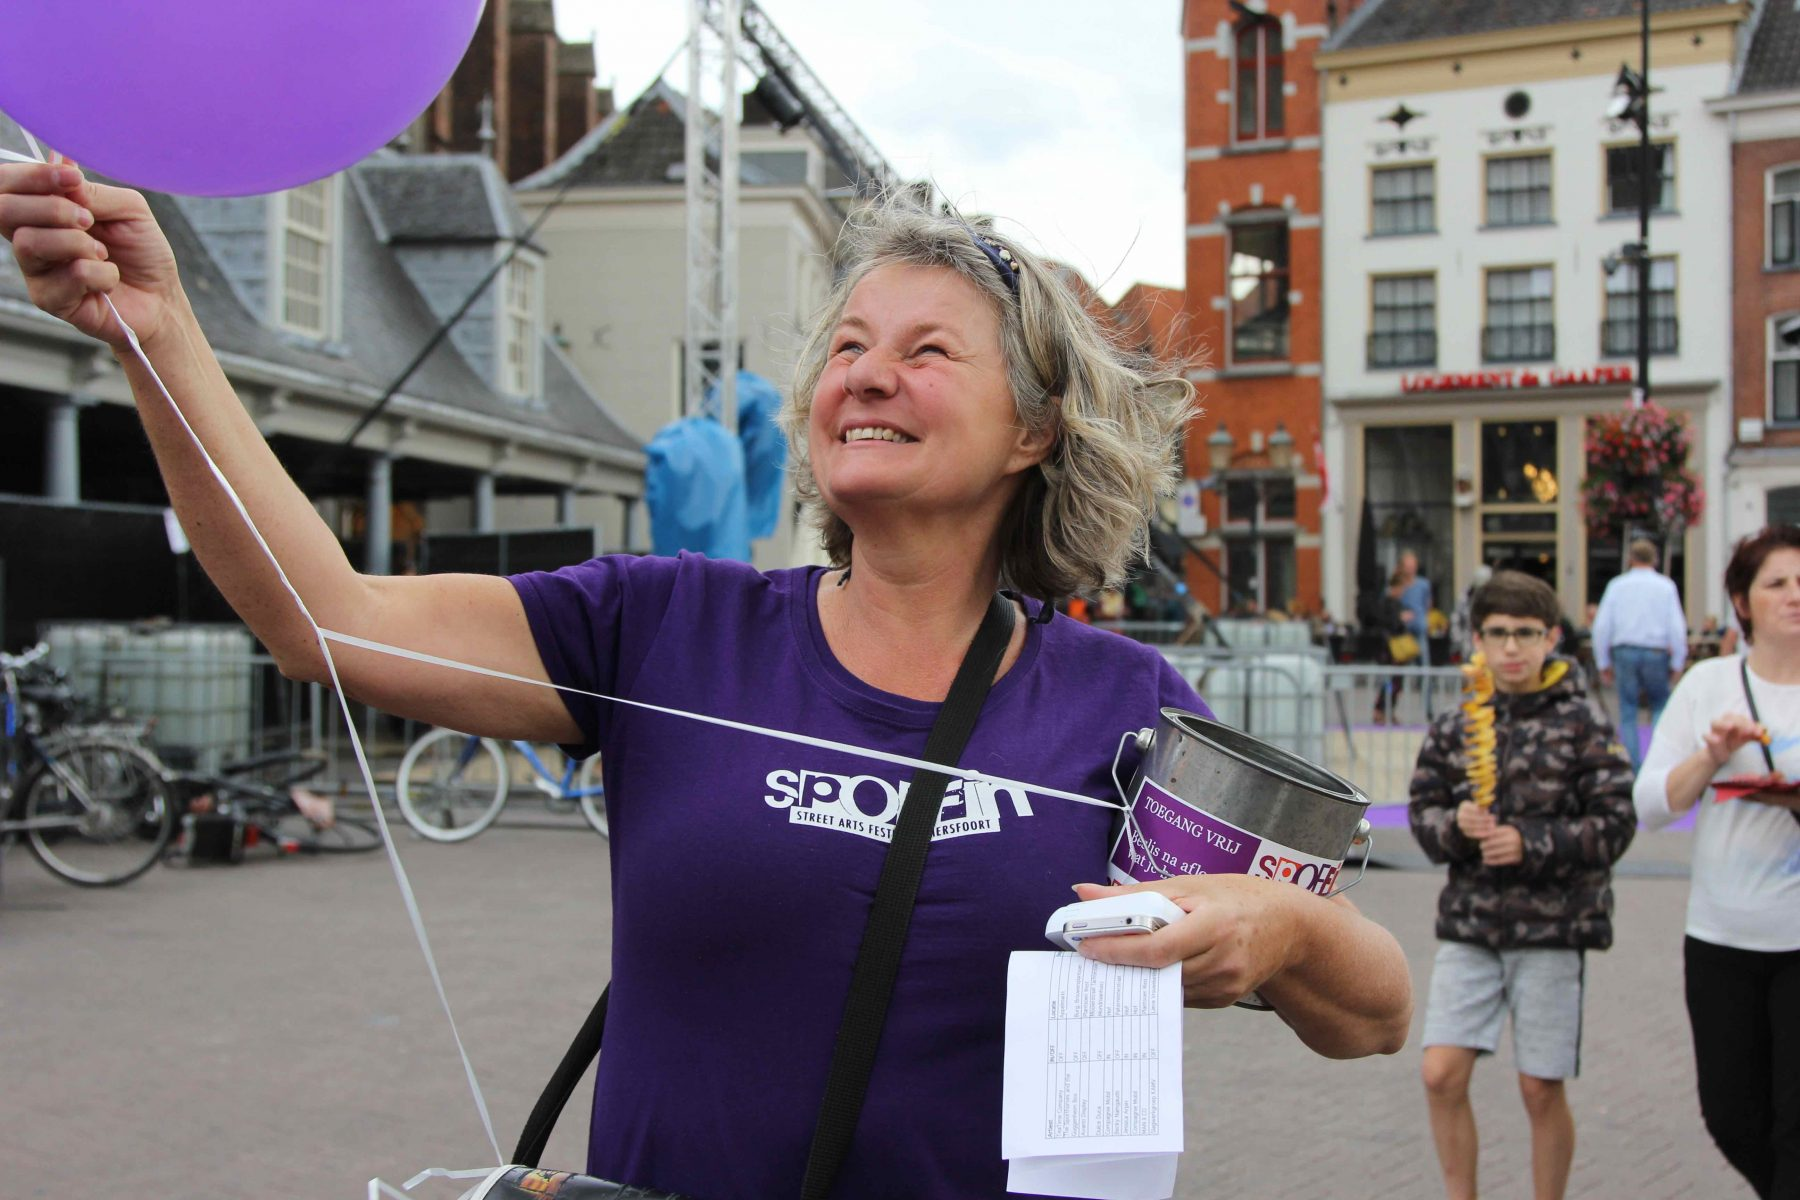 Spoffin vrijwilliger met paars T-shirt, ballon en mansblik